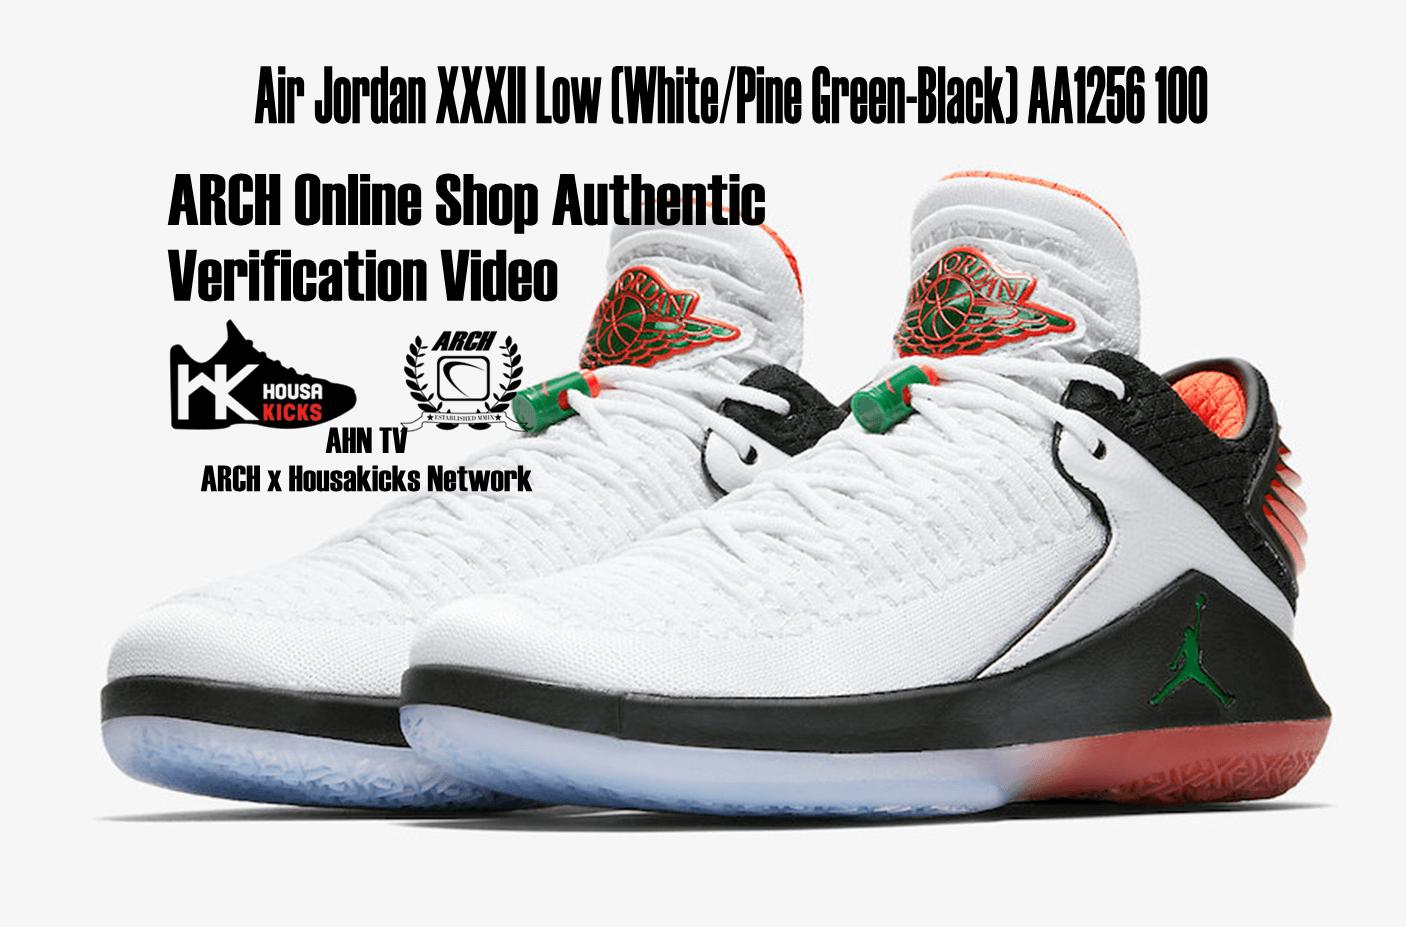 jordan xxxii low white